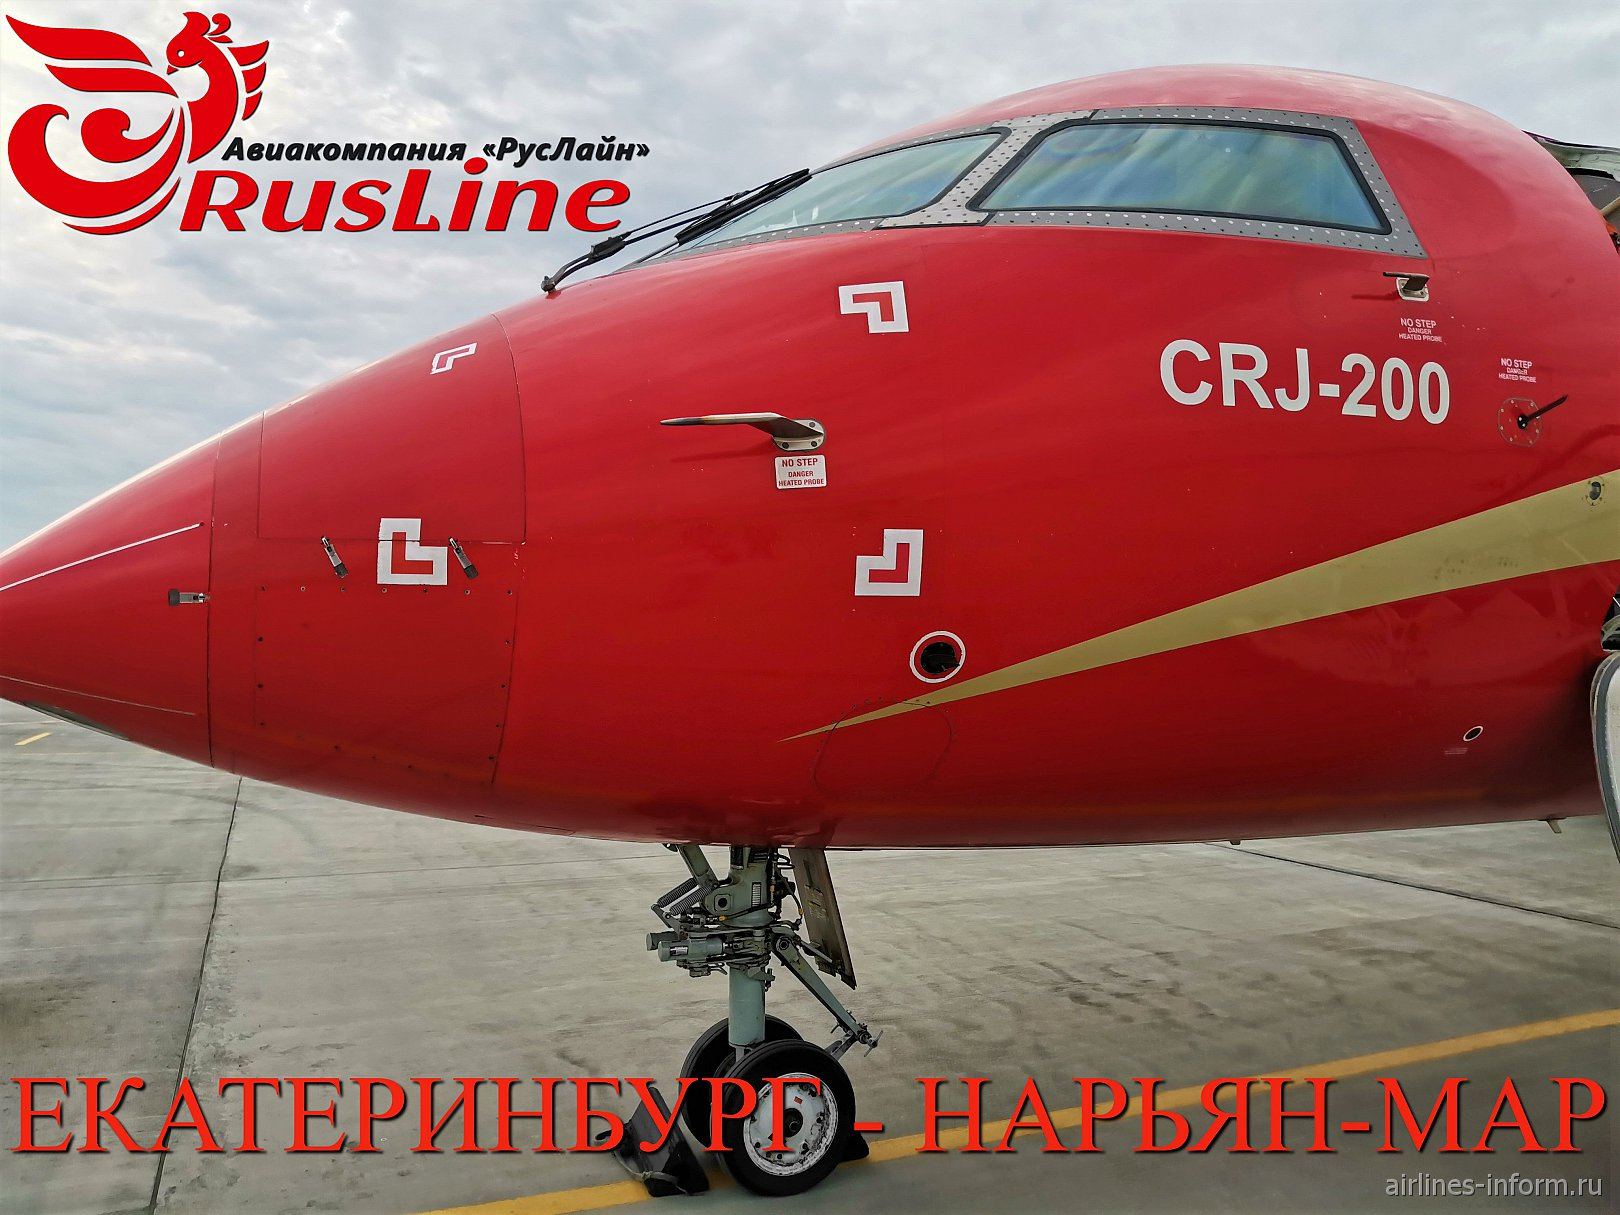 РусЛайн: Екатеринбург - Нарьян-Мар